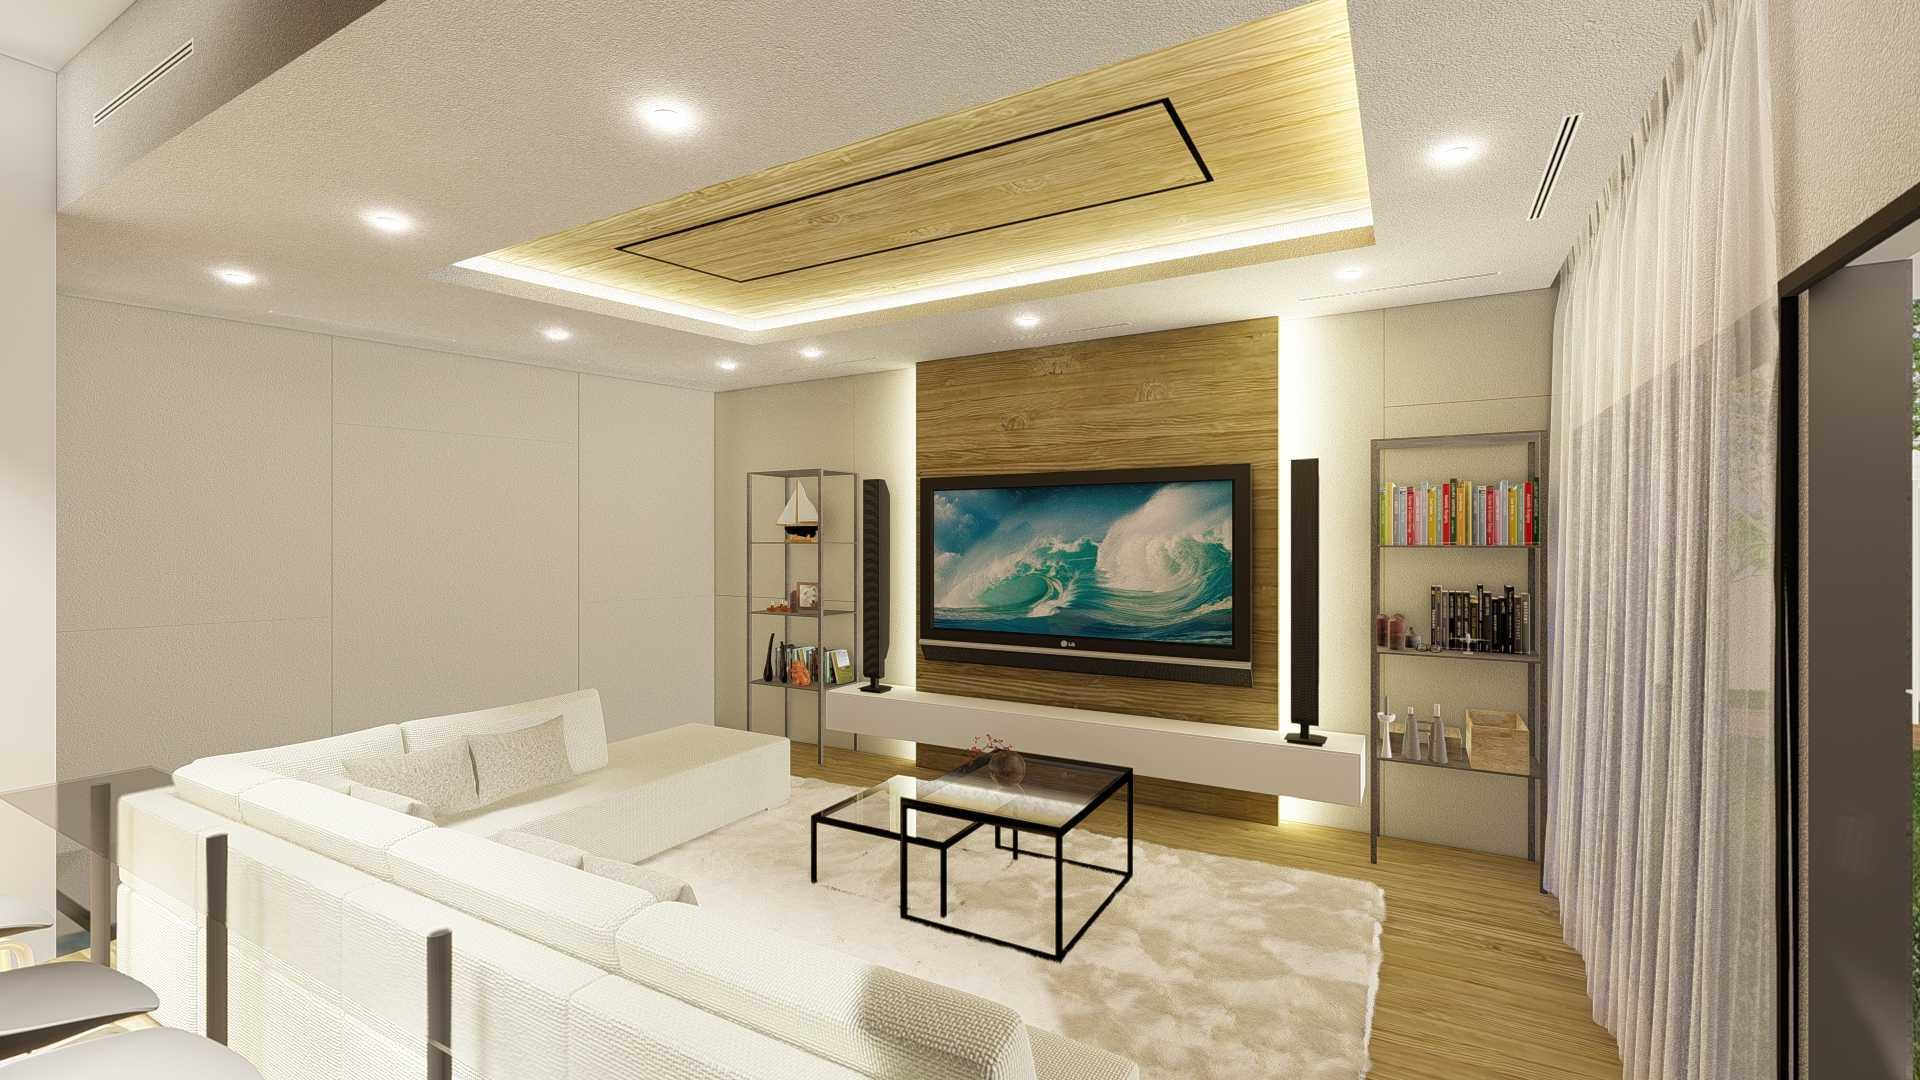 Raaj Gill Arsitek Terrace House Jakarta, Daerah Khusus Ibukota Jakarta, Indonesia Jakarta, Daerah Khusus Ibukota Jakarta, Indonesia Raaj-Gill-Arsitek-Terrace-House  74869